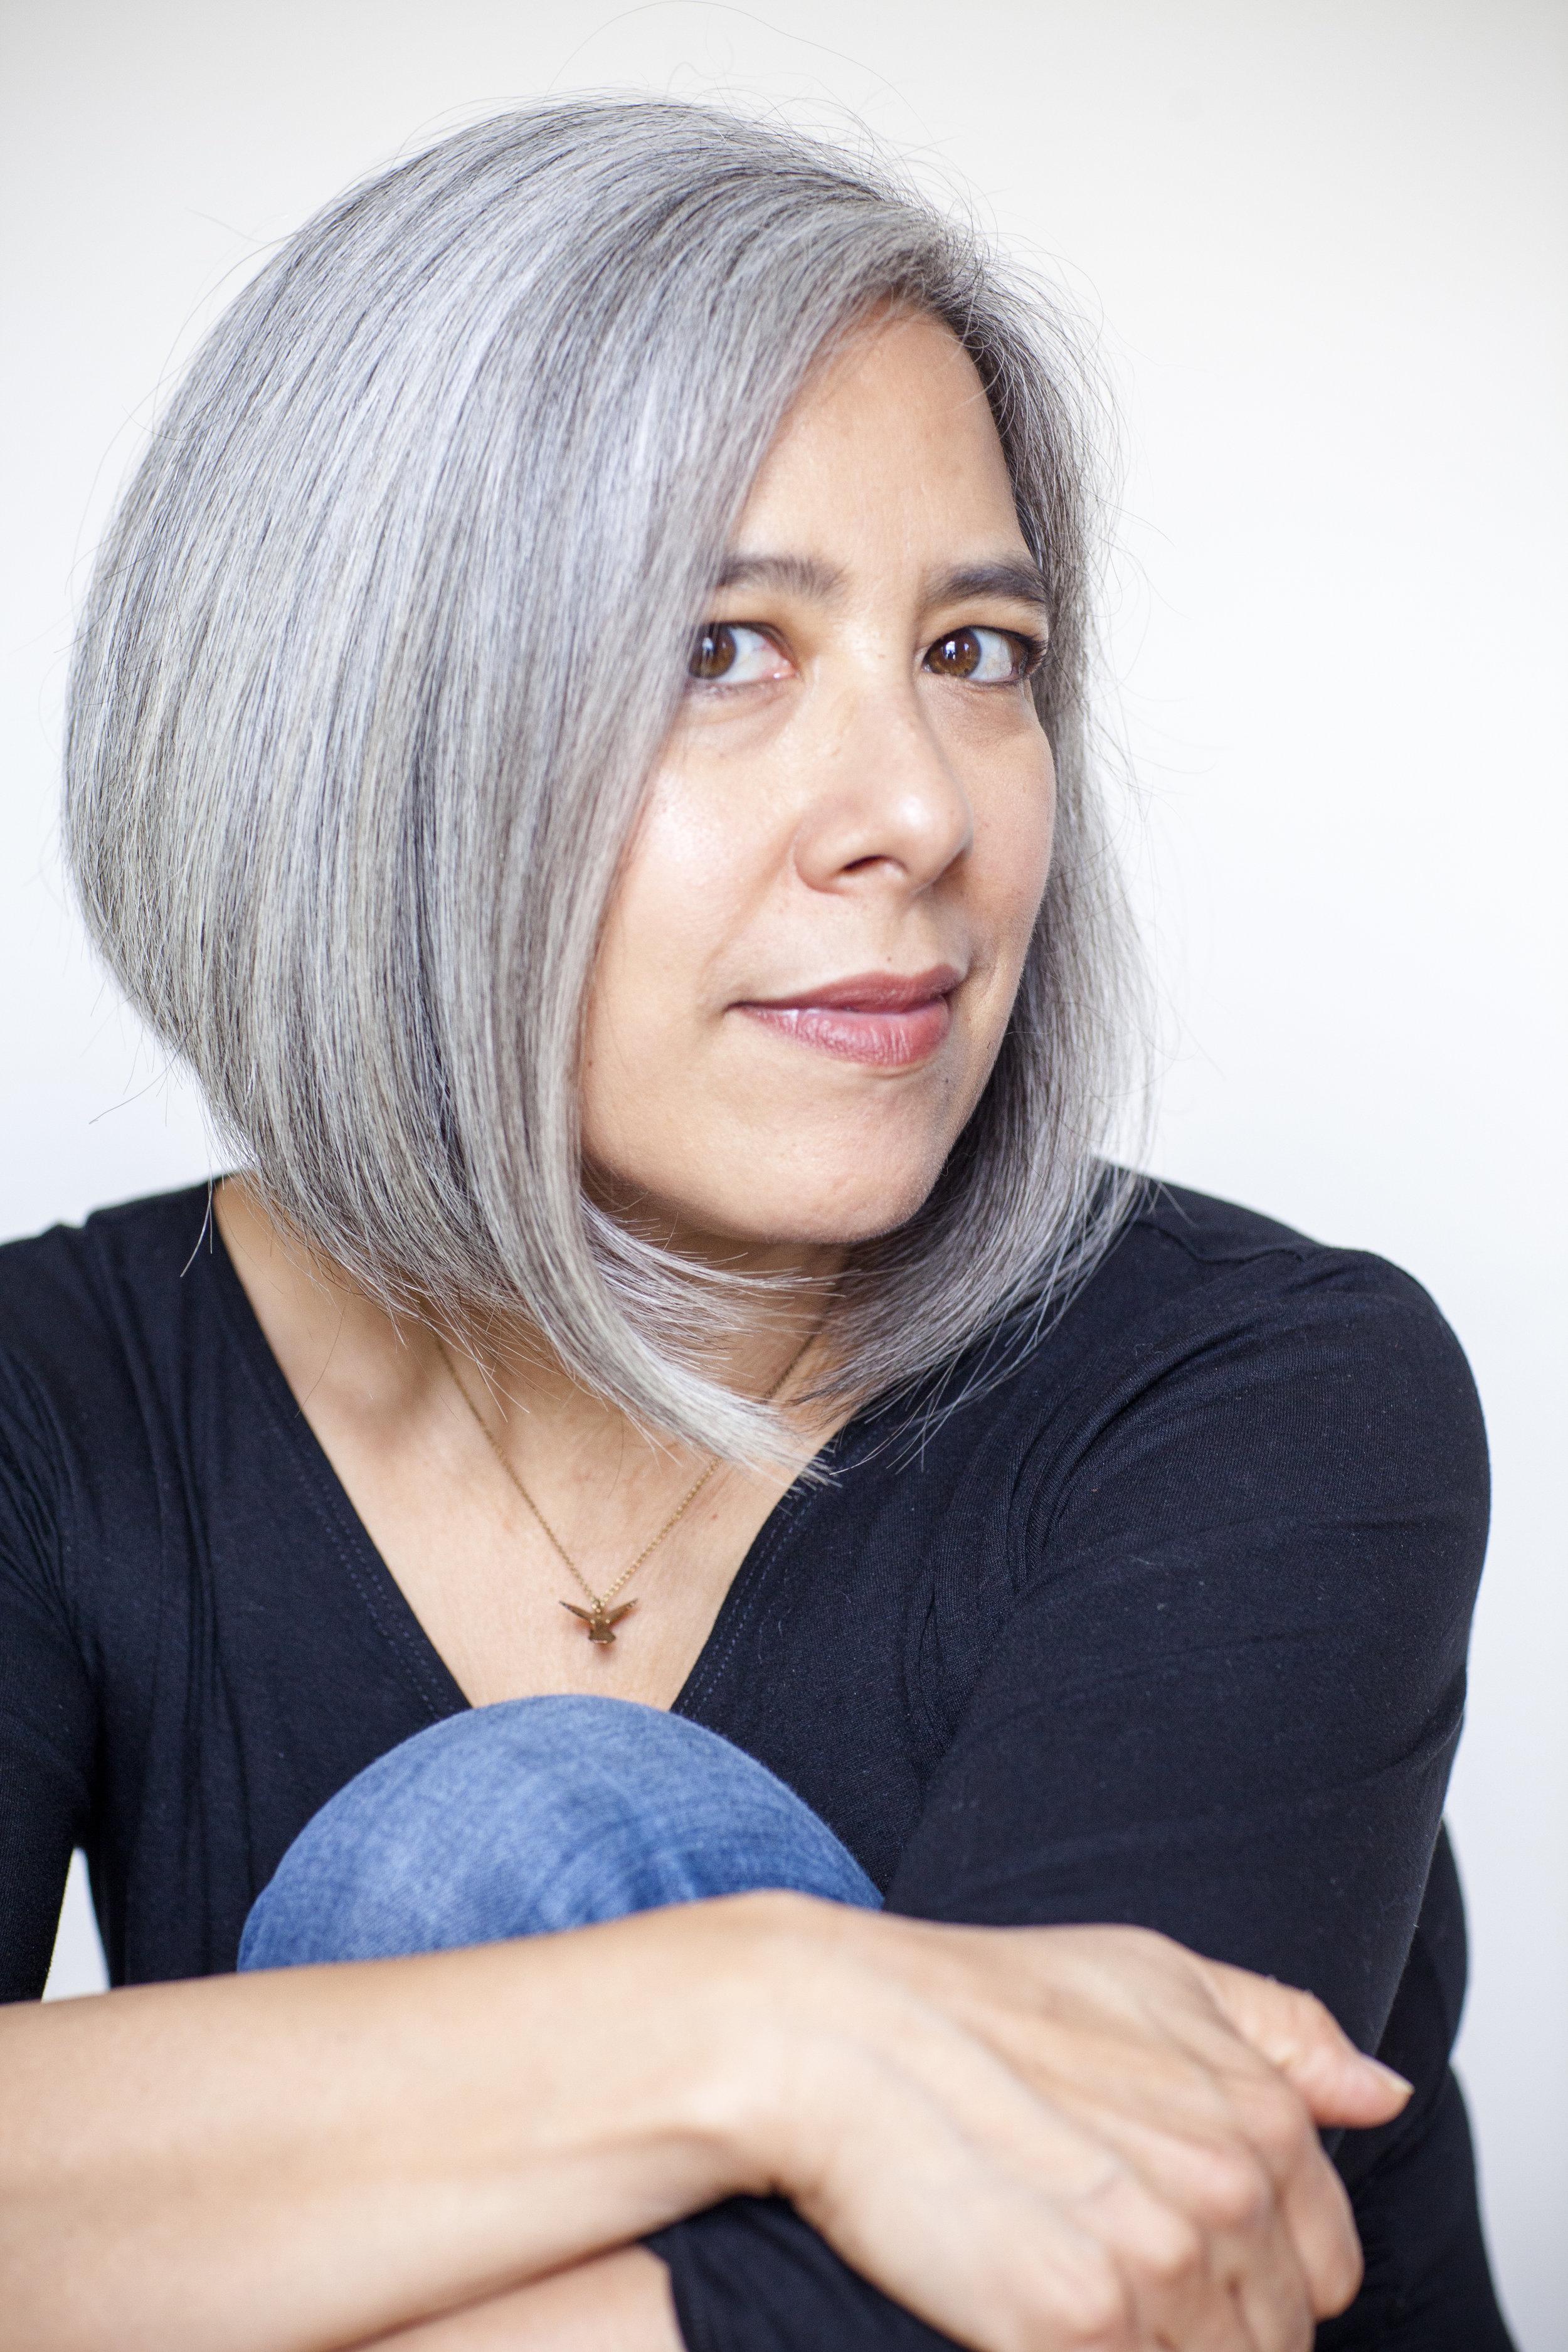 Author photo by Heather Weston.